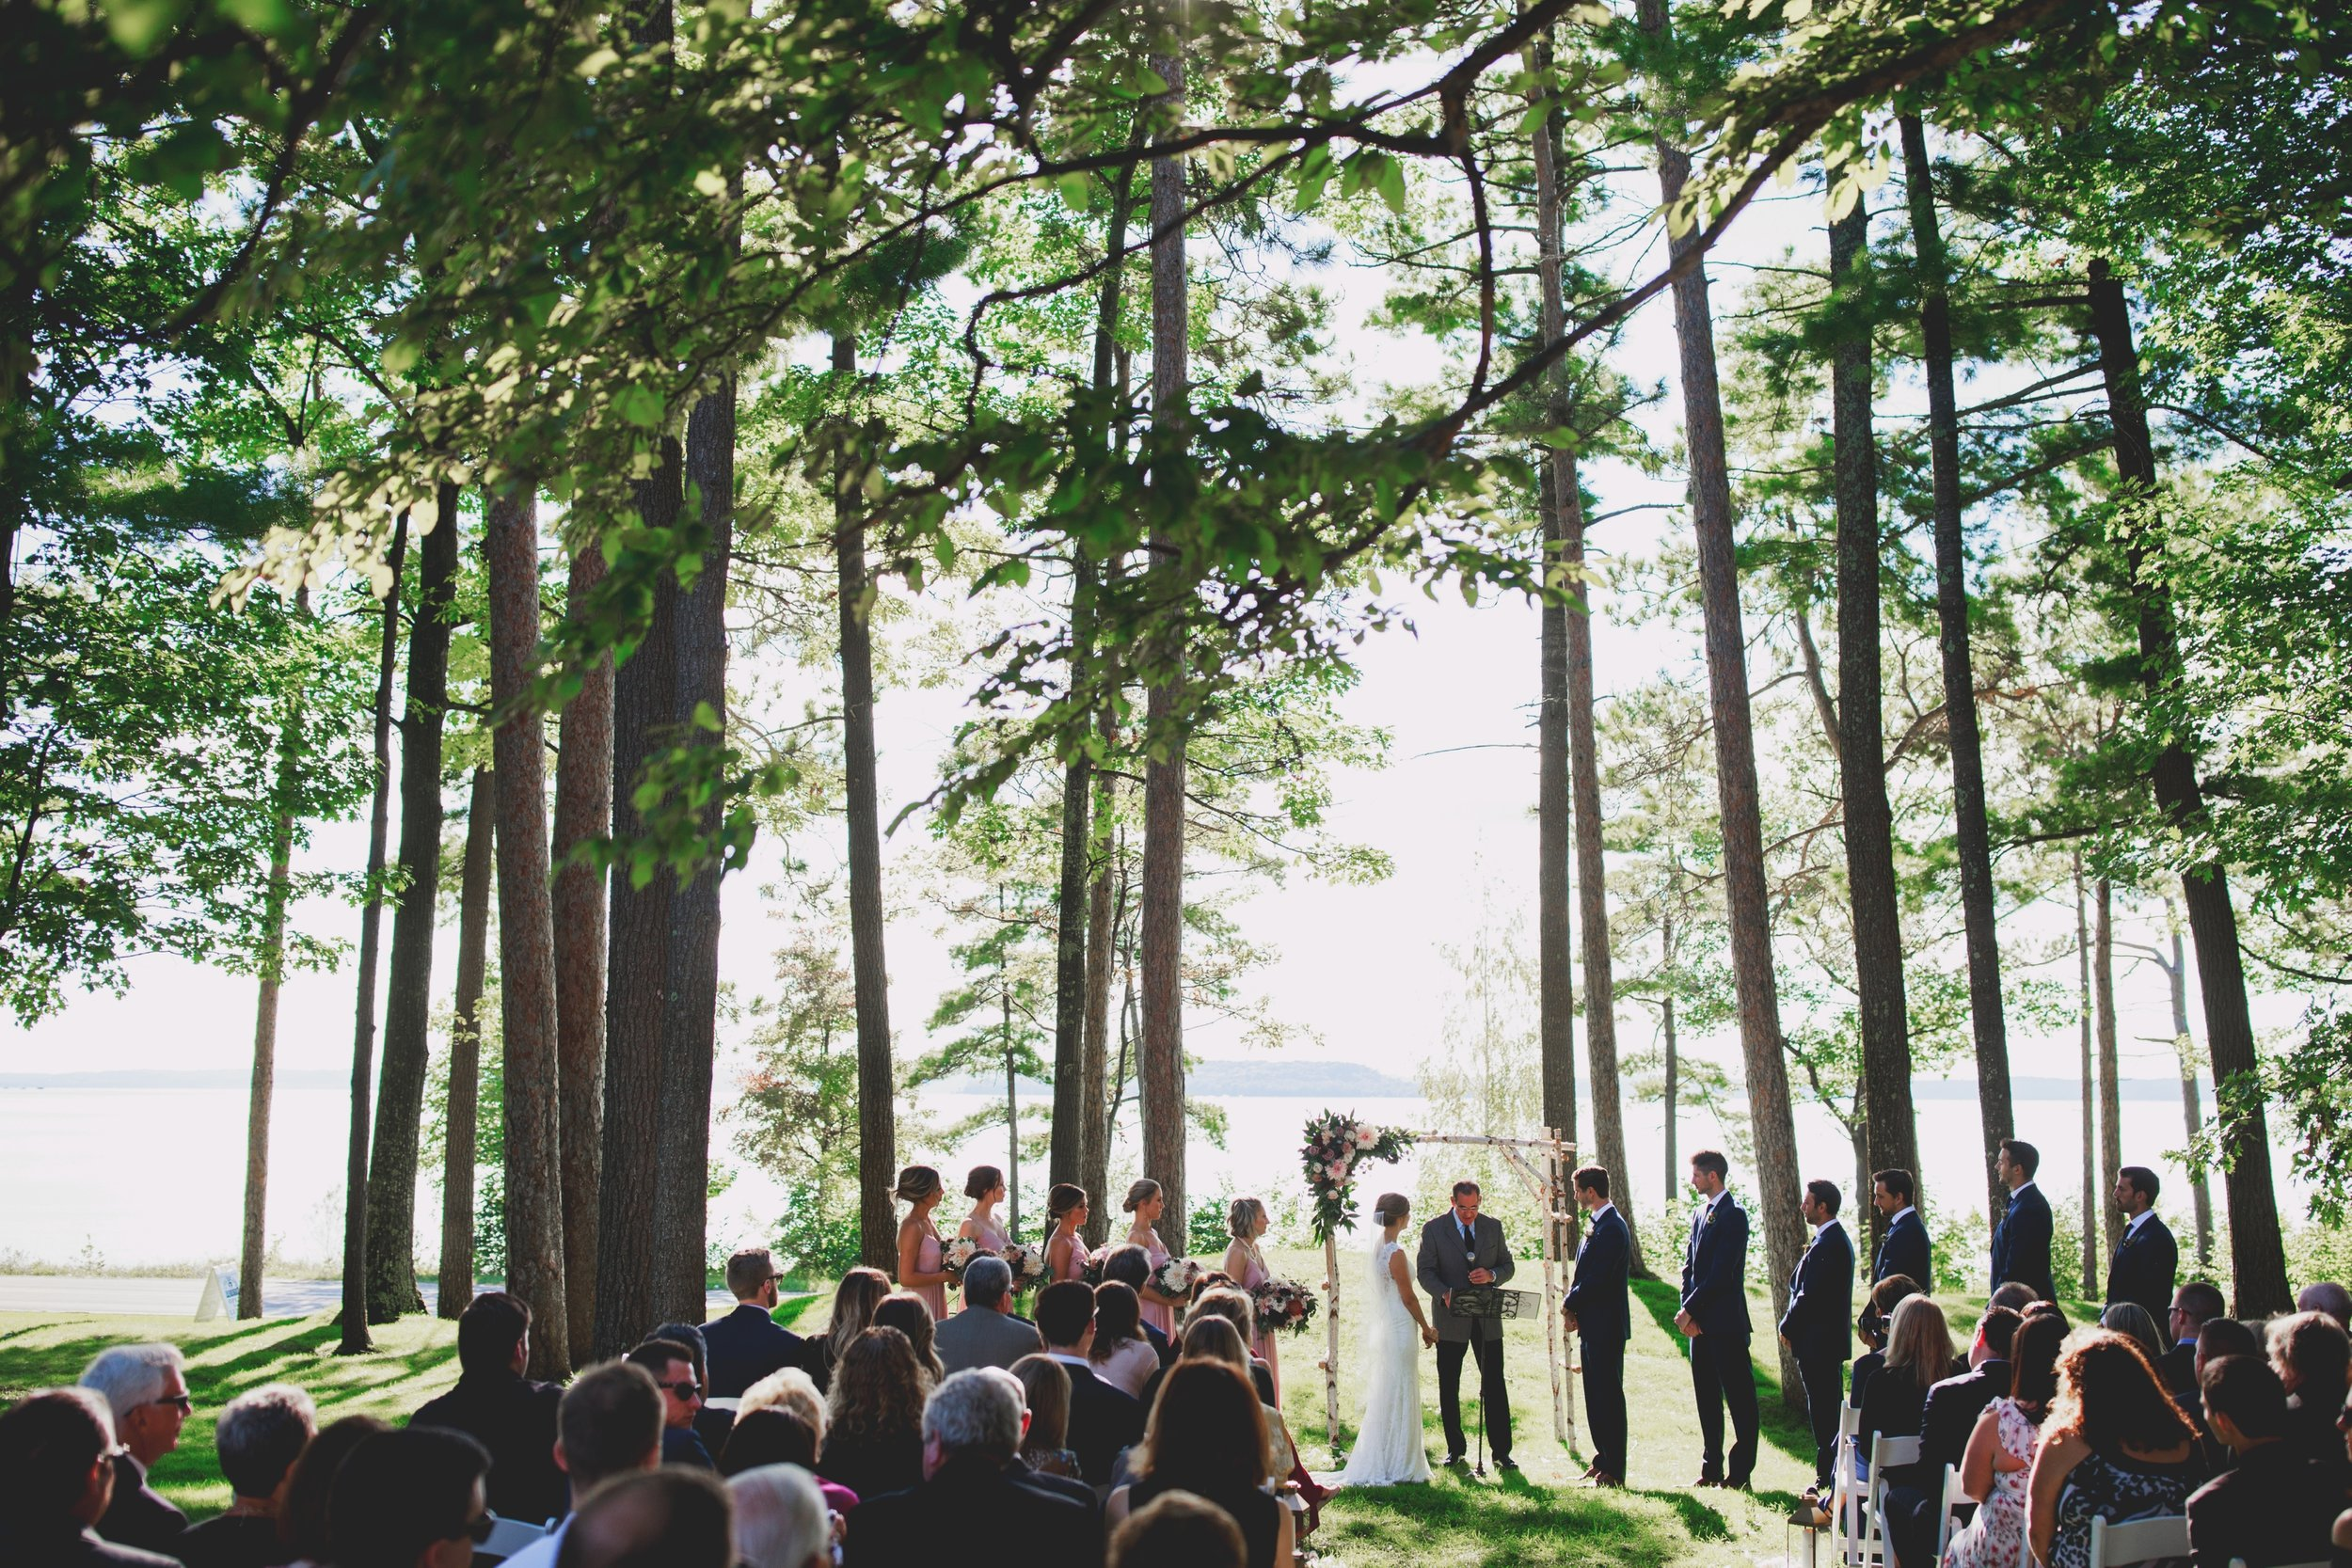 traverse_city_wedding_059.jpg